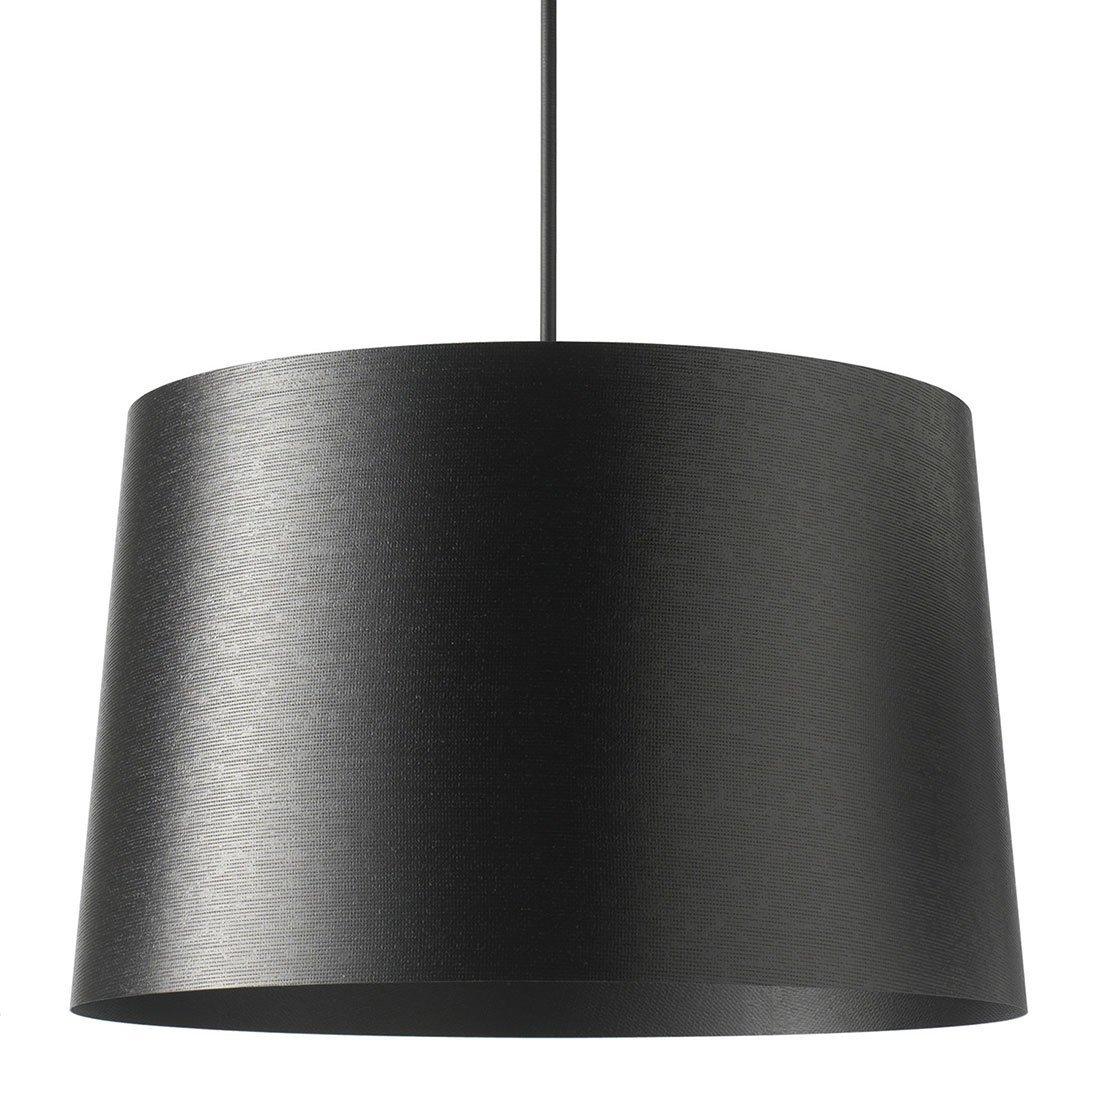 Twiggy Hanglamp - Foscarini